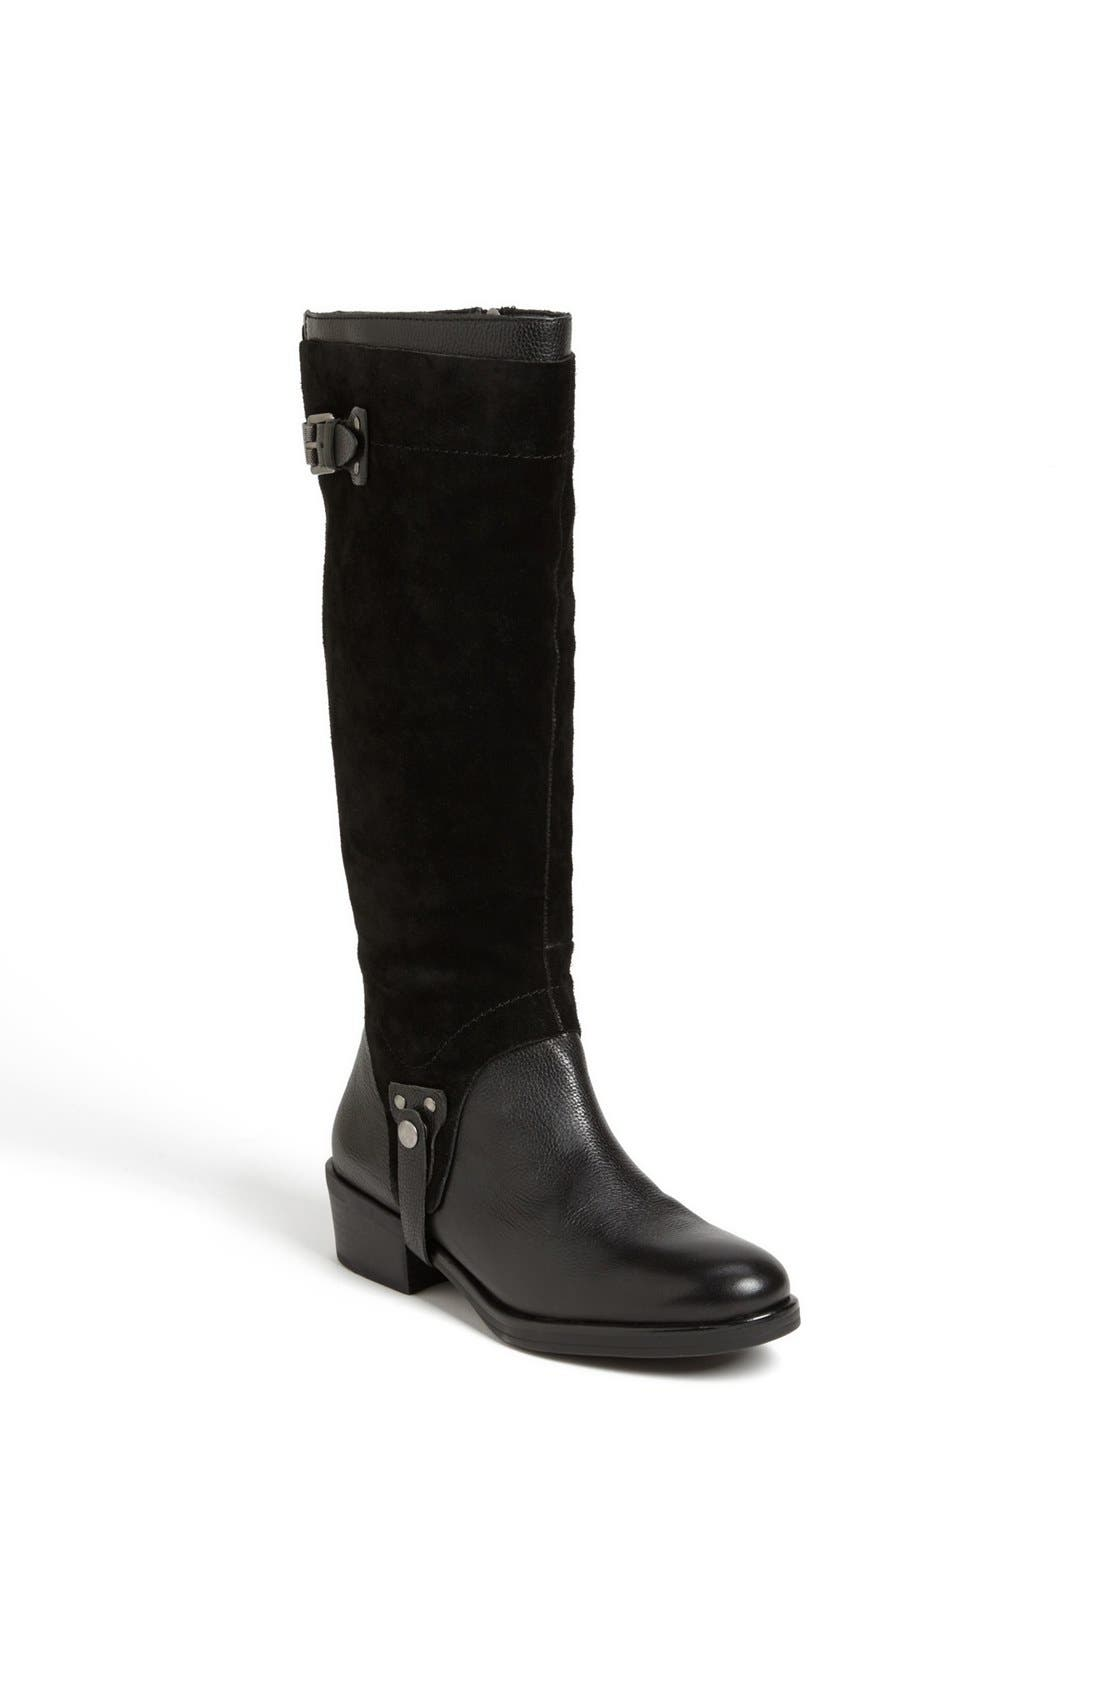 Alternate Image 1 Selected - Franco Sarto 'Bevel' Boot